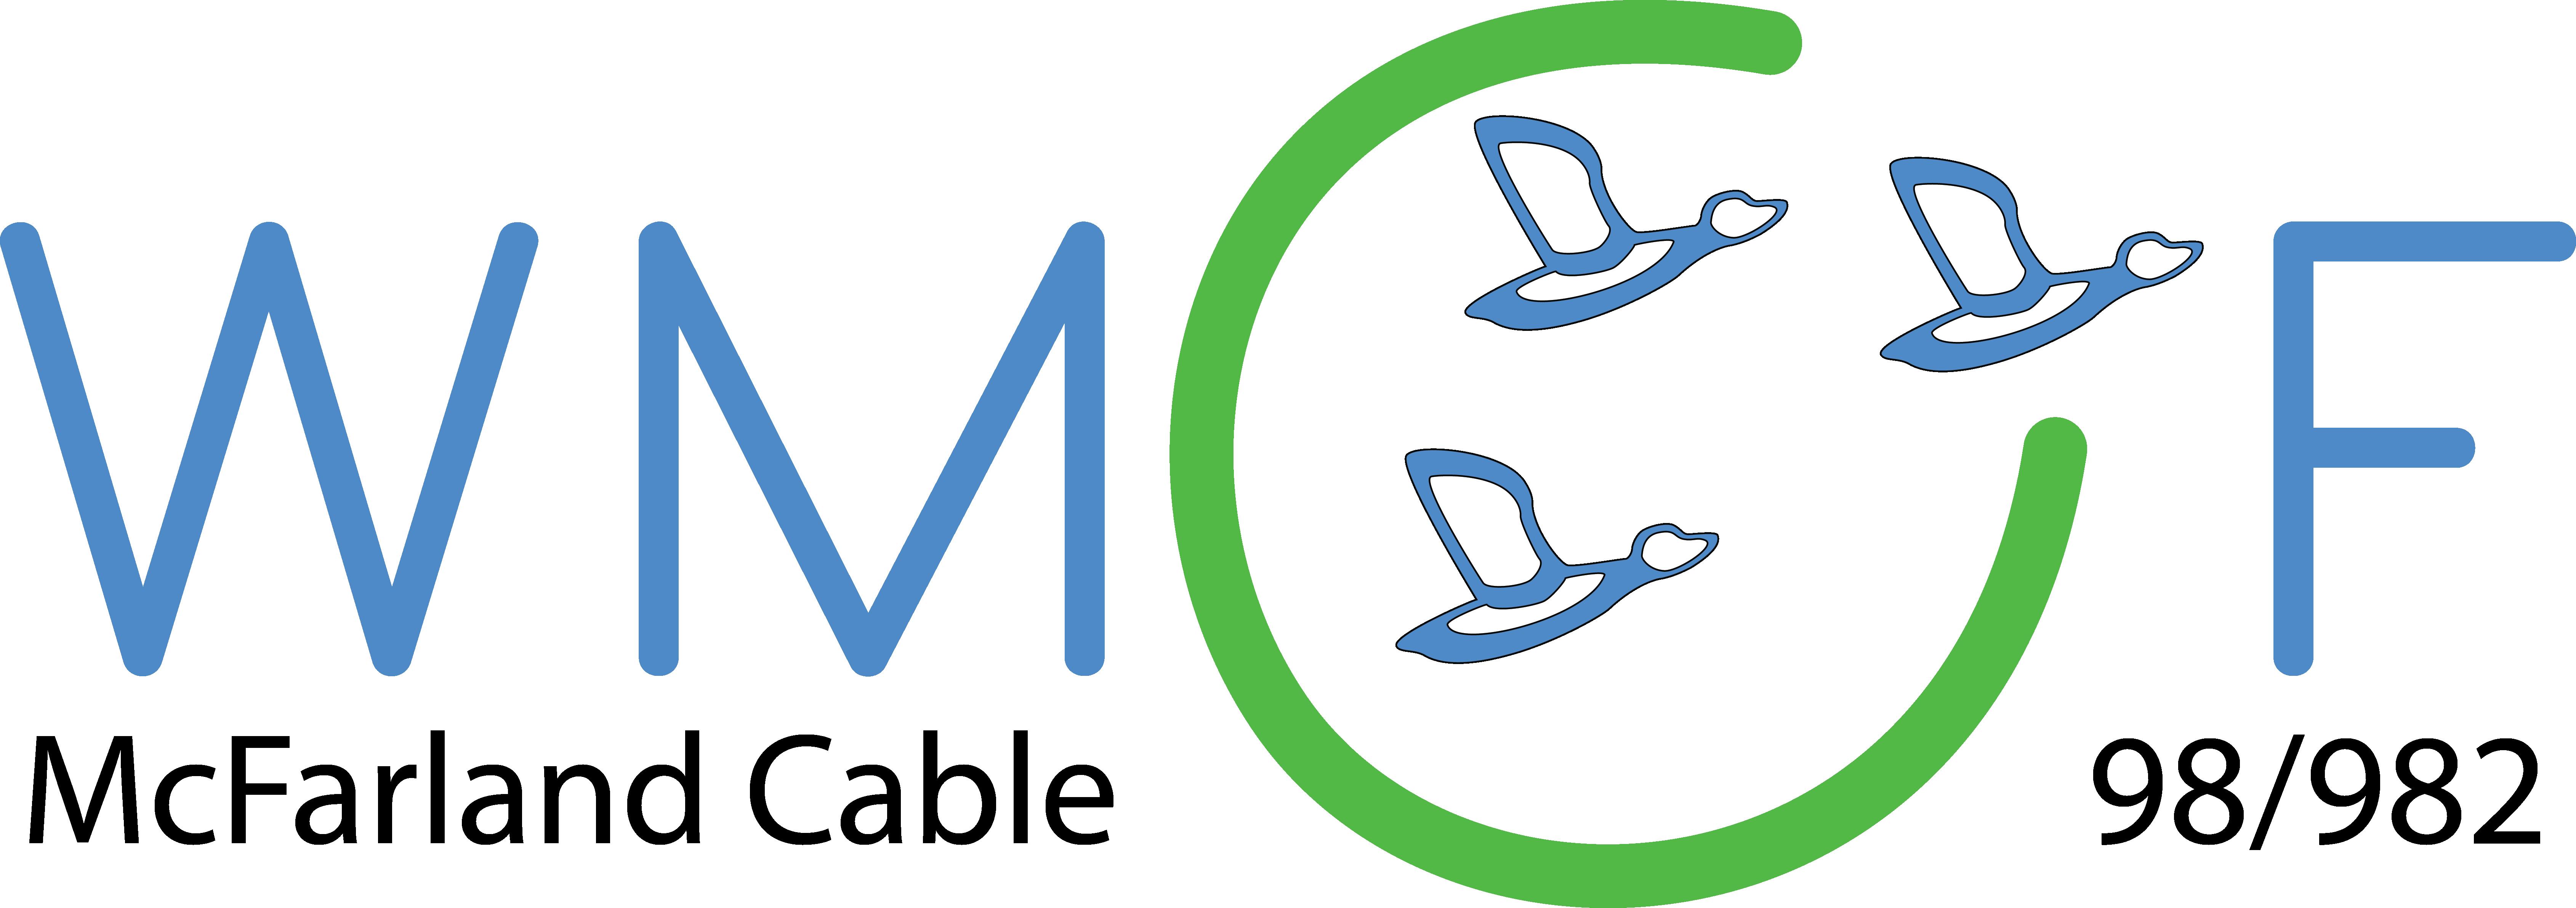 WMCF - McFarland Logo